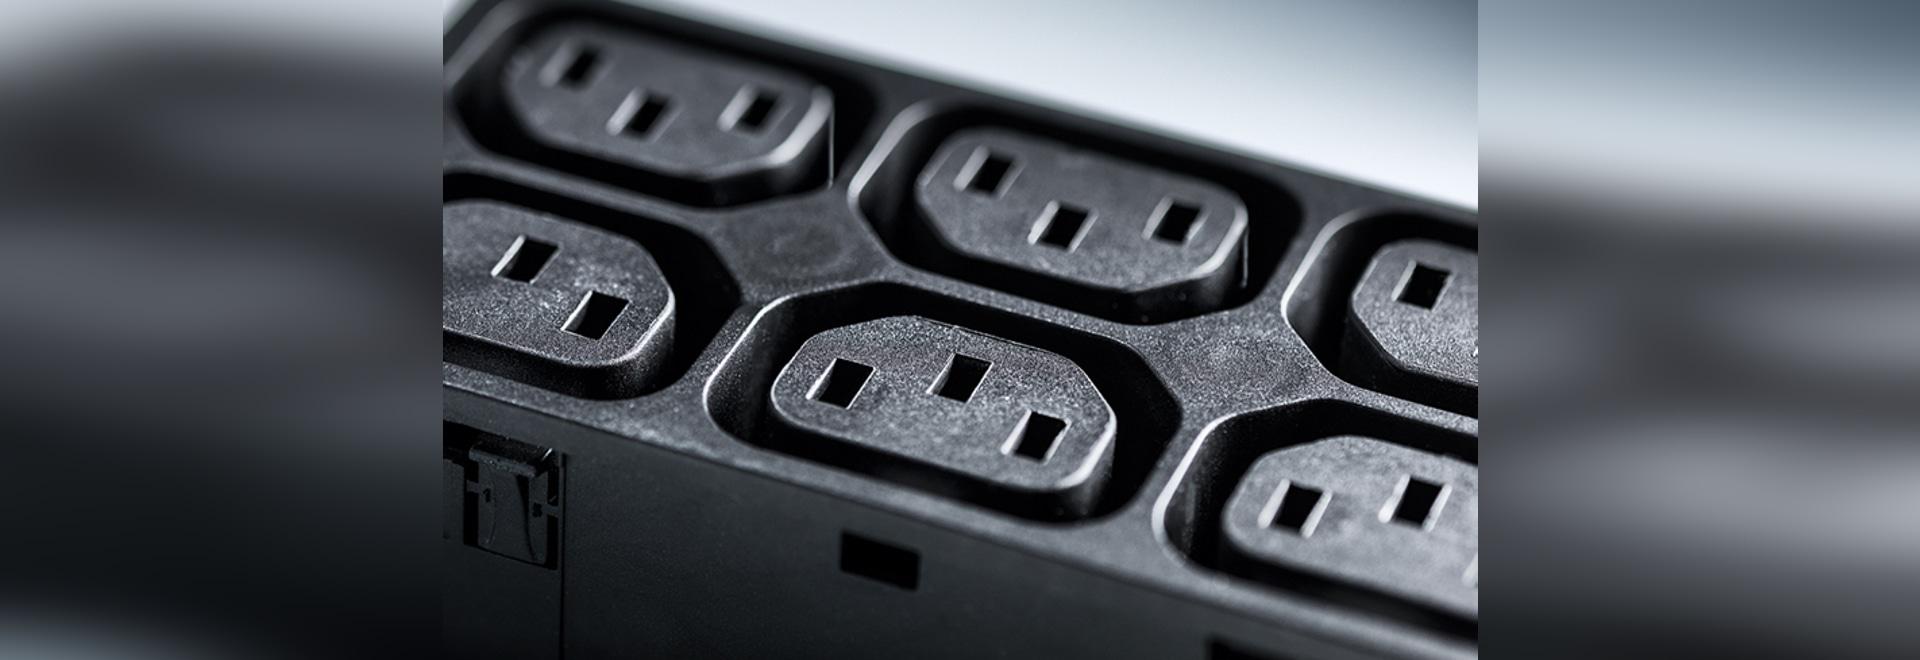 Serie 4751: Uscita per apparecchi IEC a banda larga Tipo F